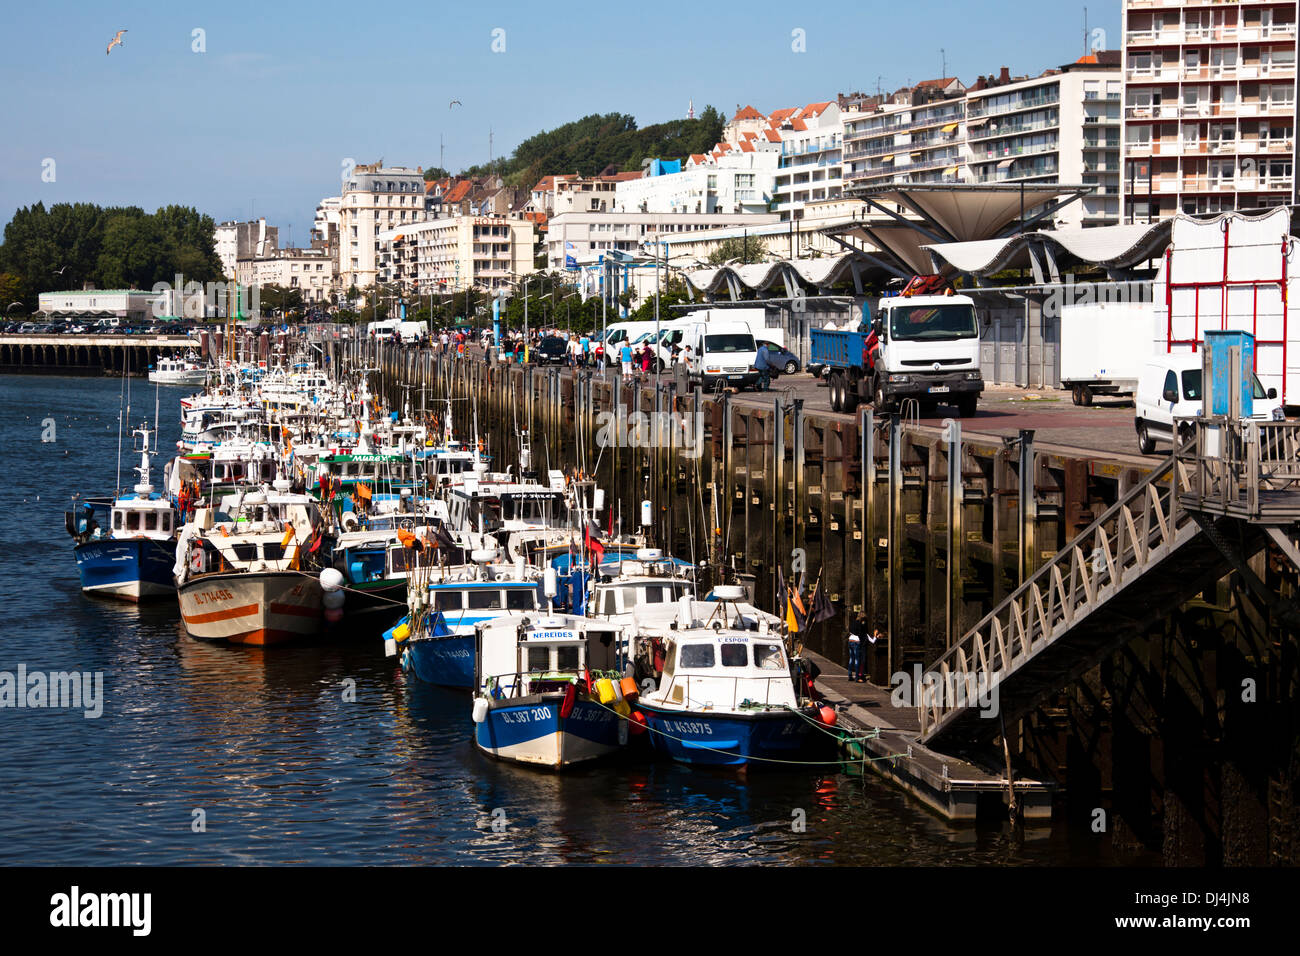 Fishing fleet at Boulogne-sur-Mer - Stock Image